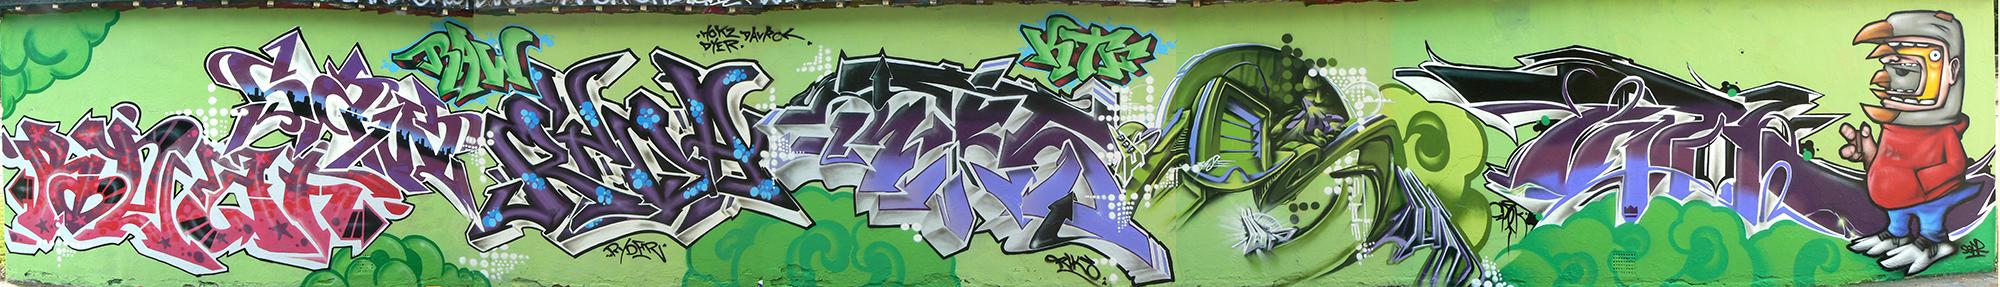 Brighton '08. With Reaf, Saw, Ryder, Riks, Zase, Epok